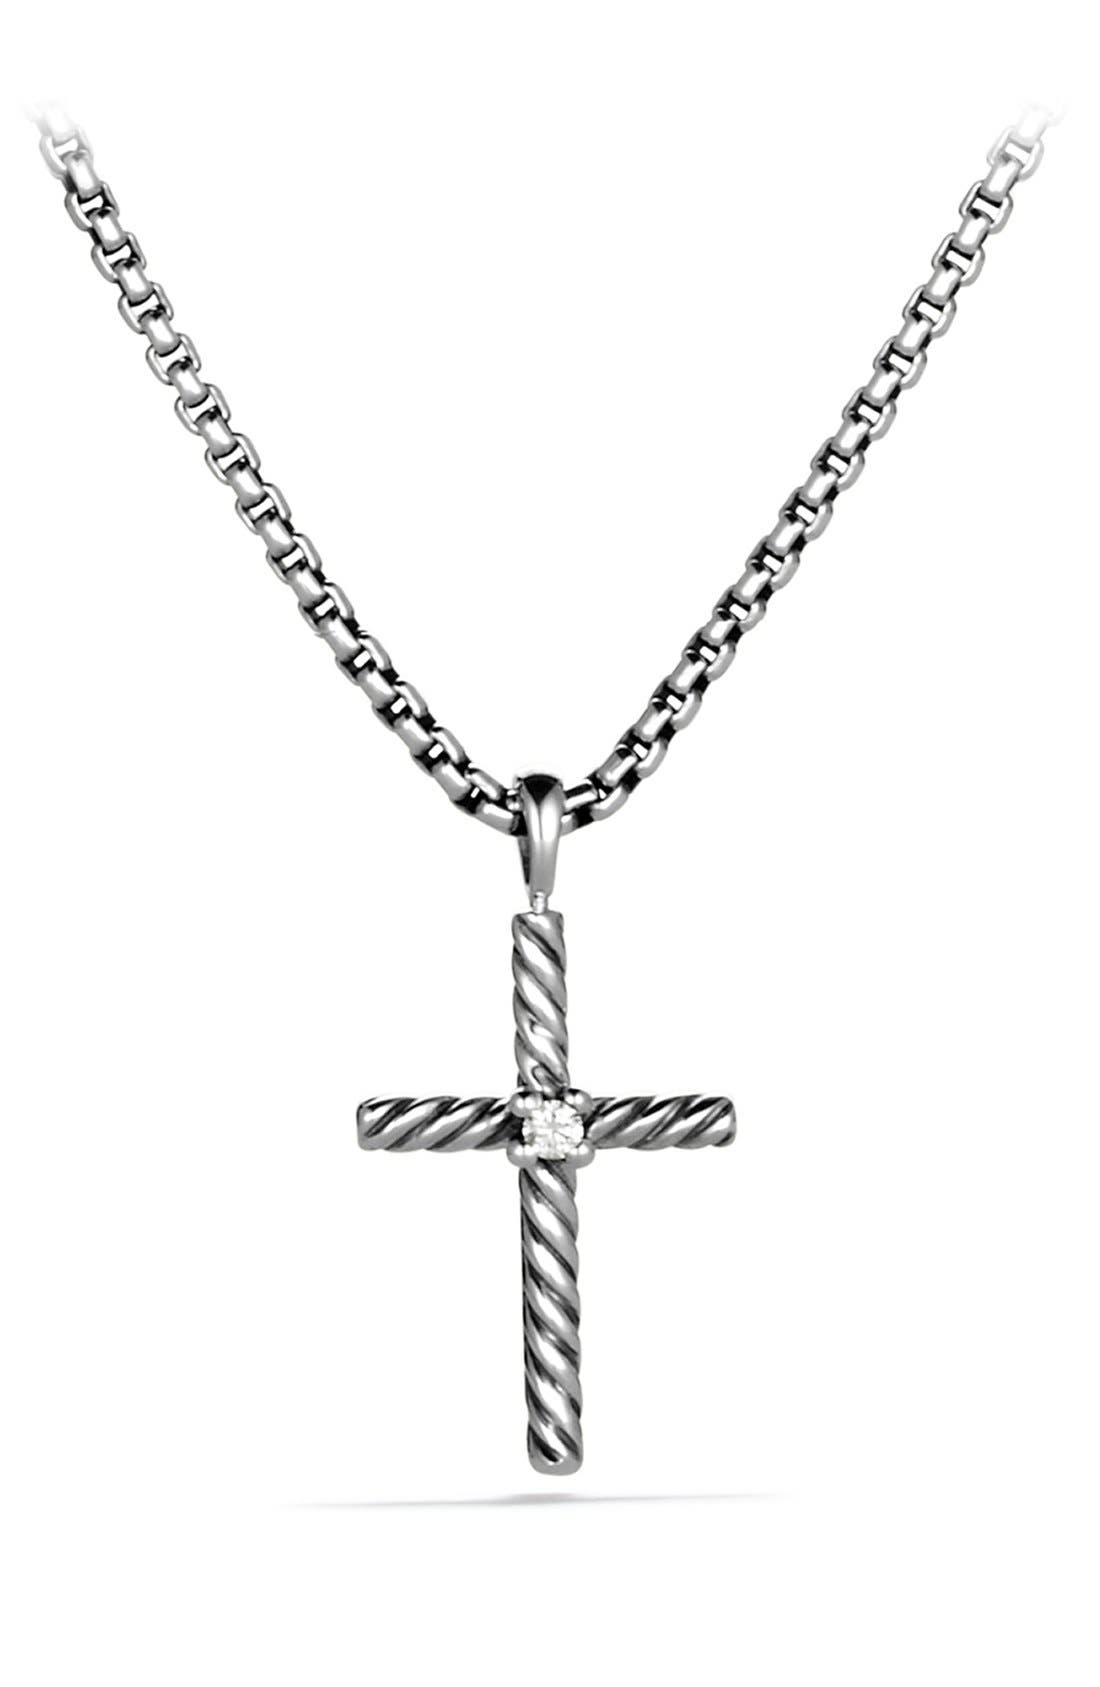 Main Image - David Yurman 'Cable Classics' Cross with Diamond on Chain